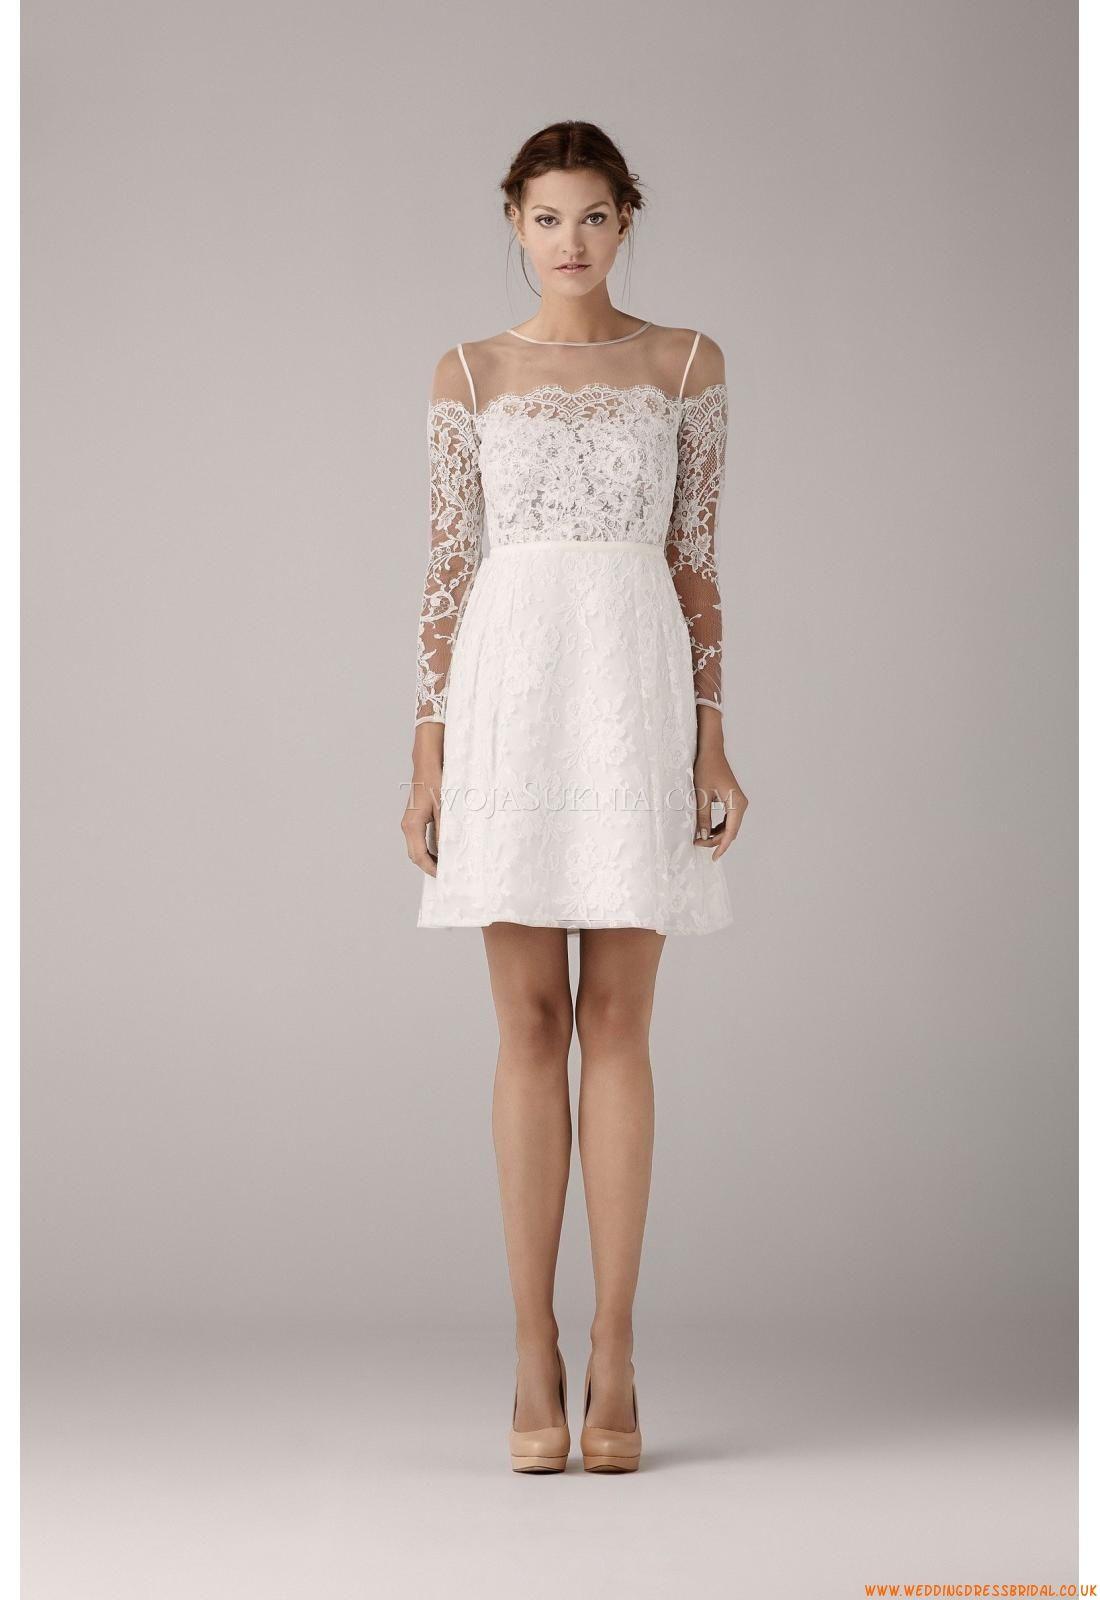 Wedding dresses anna kara ivy 2014 hochzeitsideen pinterest wedding dresses anna kara ivy 2014 junglespirit Choice Image